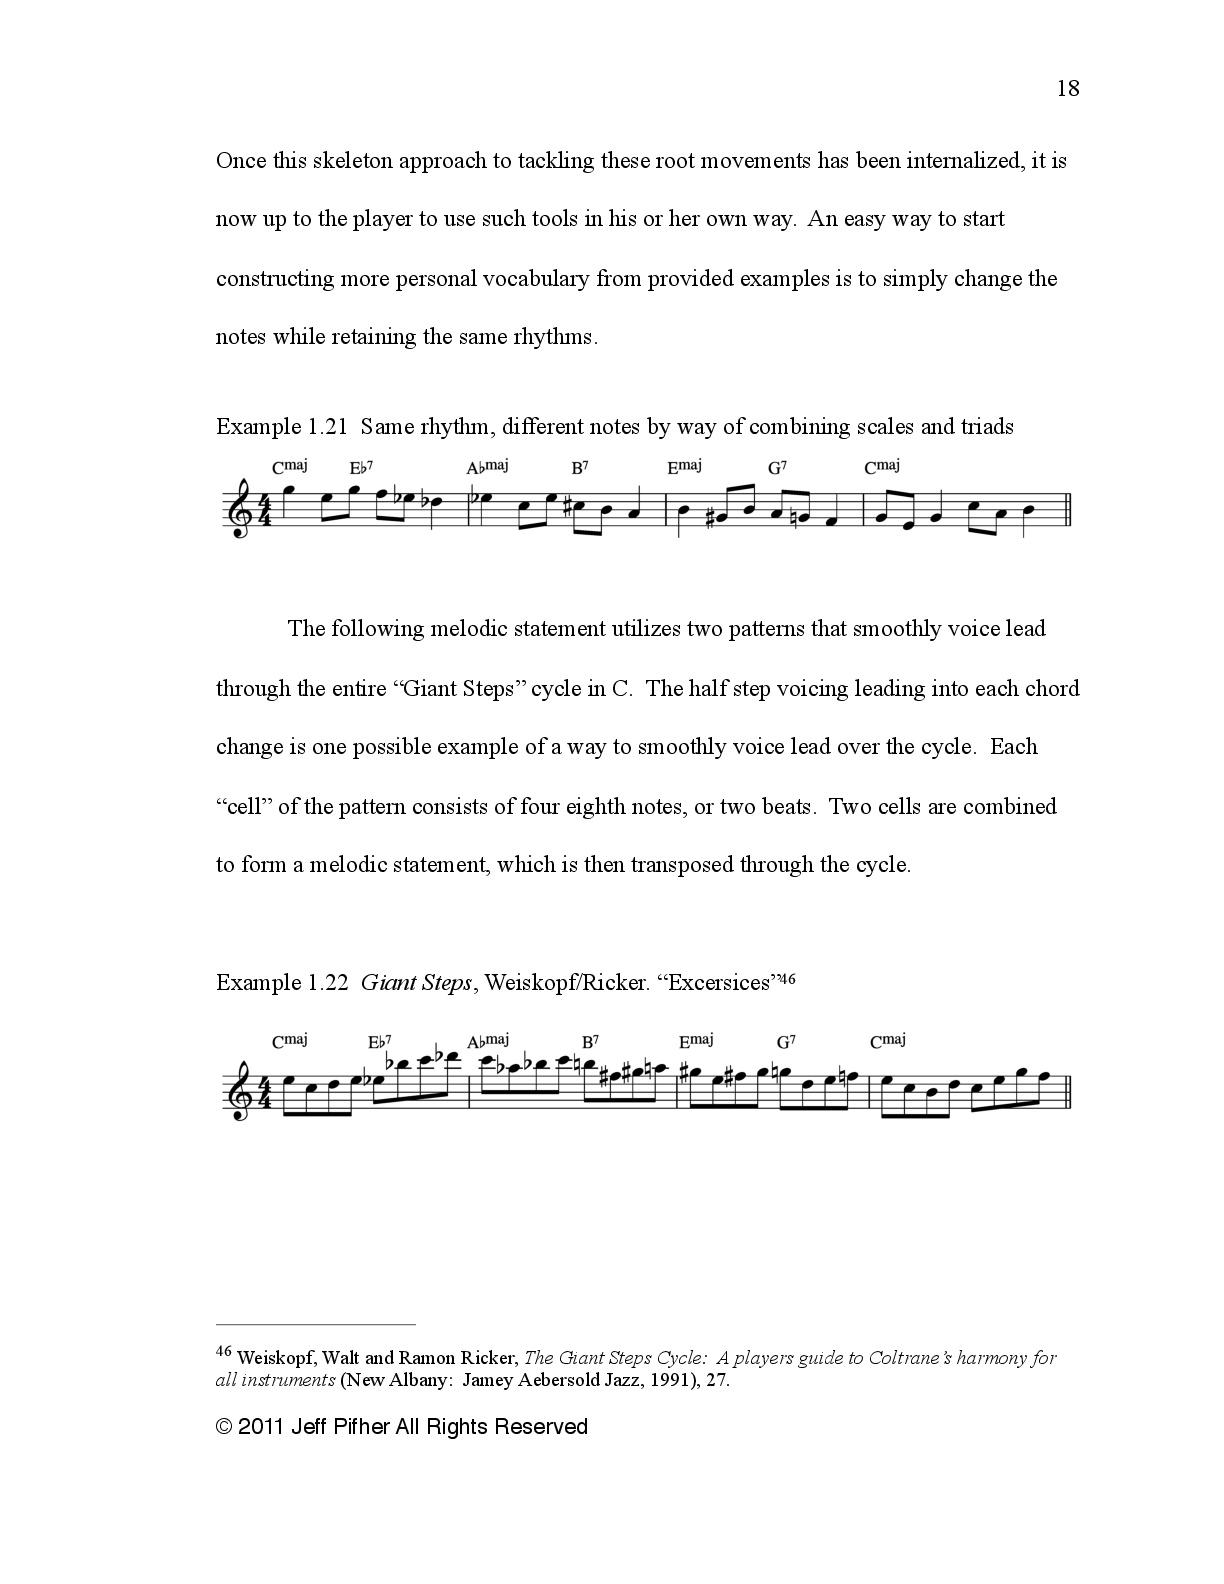 Jeff-Pifher-Academic-Series-Coltrane-Cycles-018.jpg